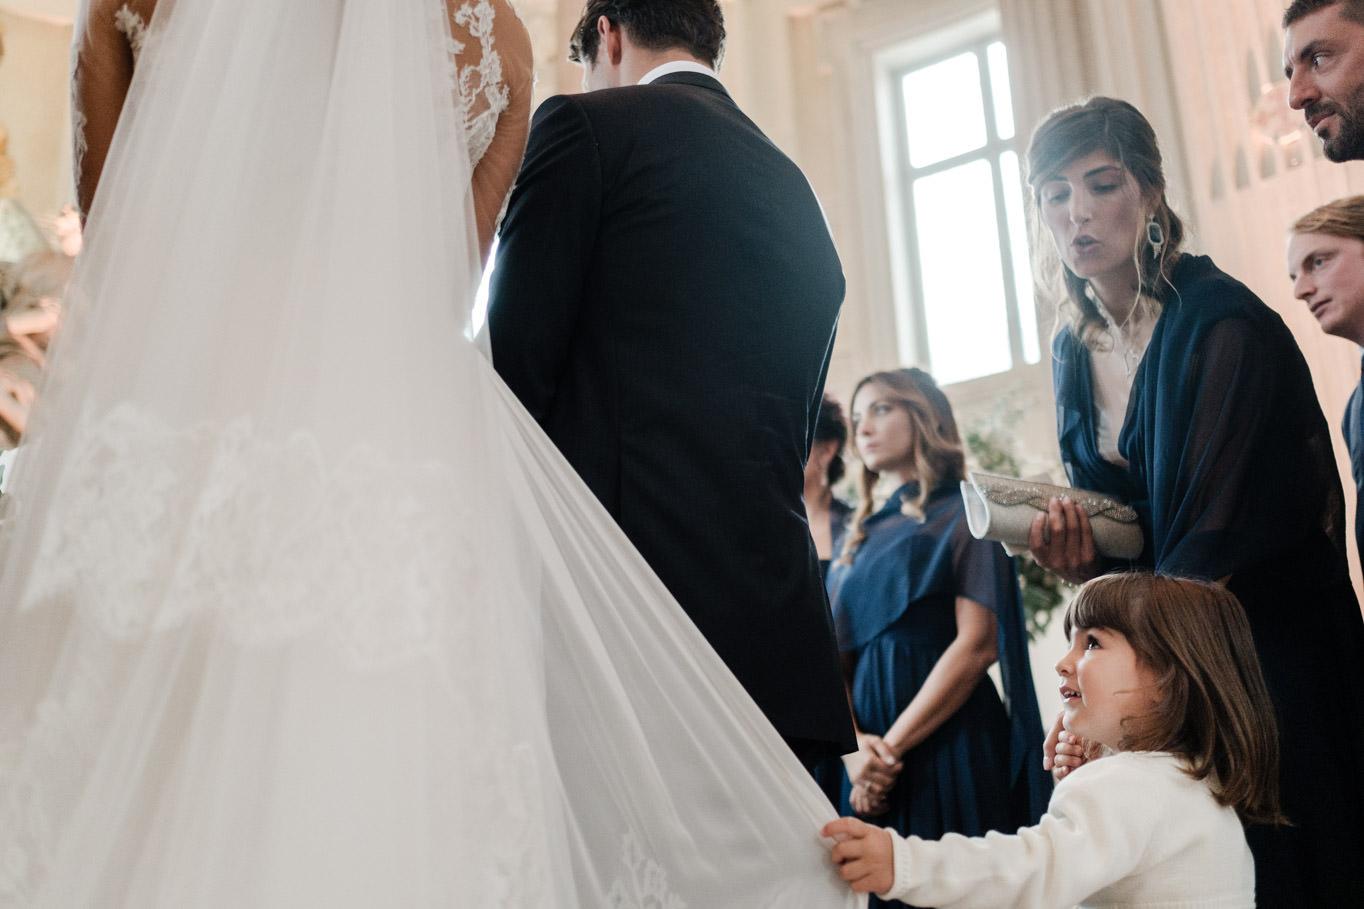 cristina chiabotto wedding ceremony with niece